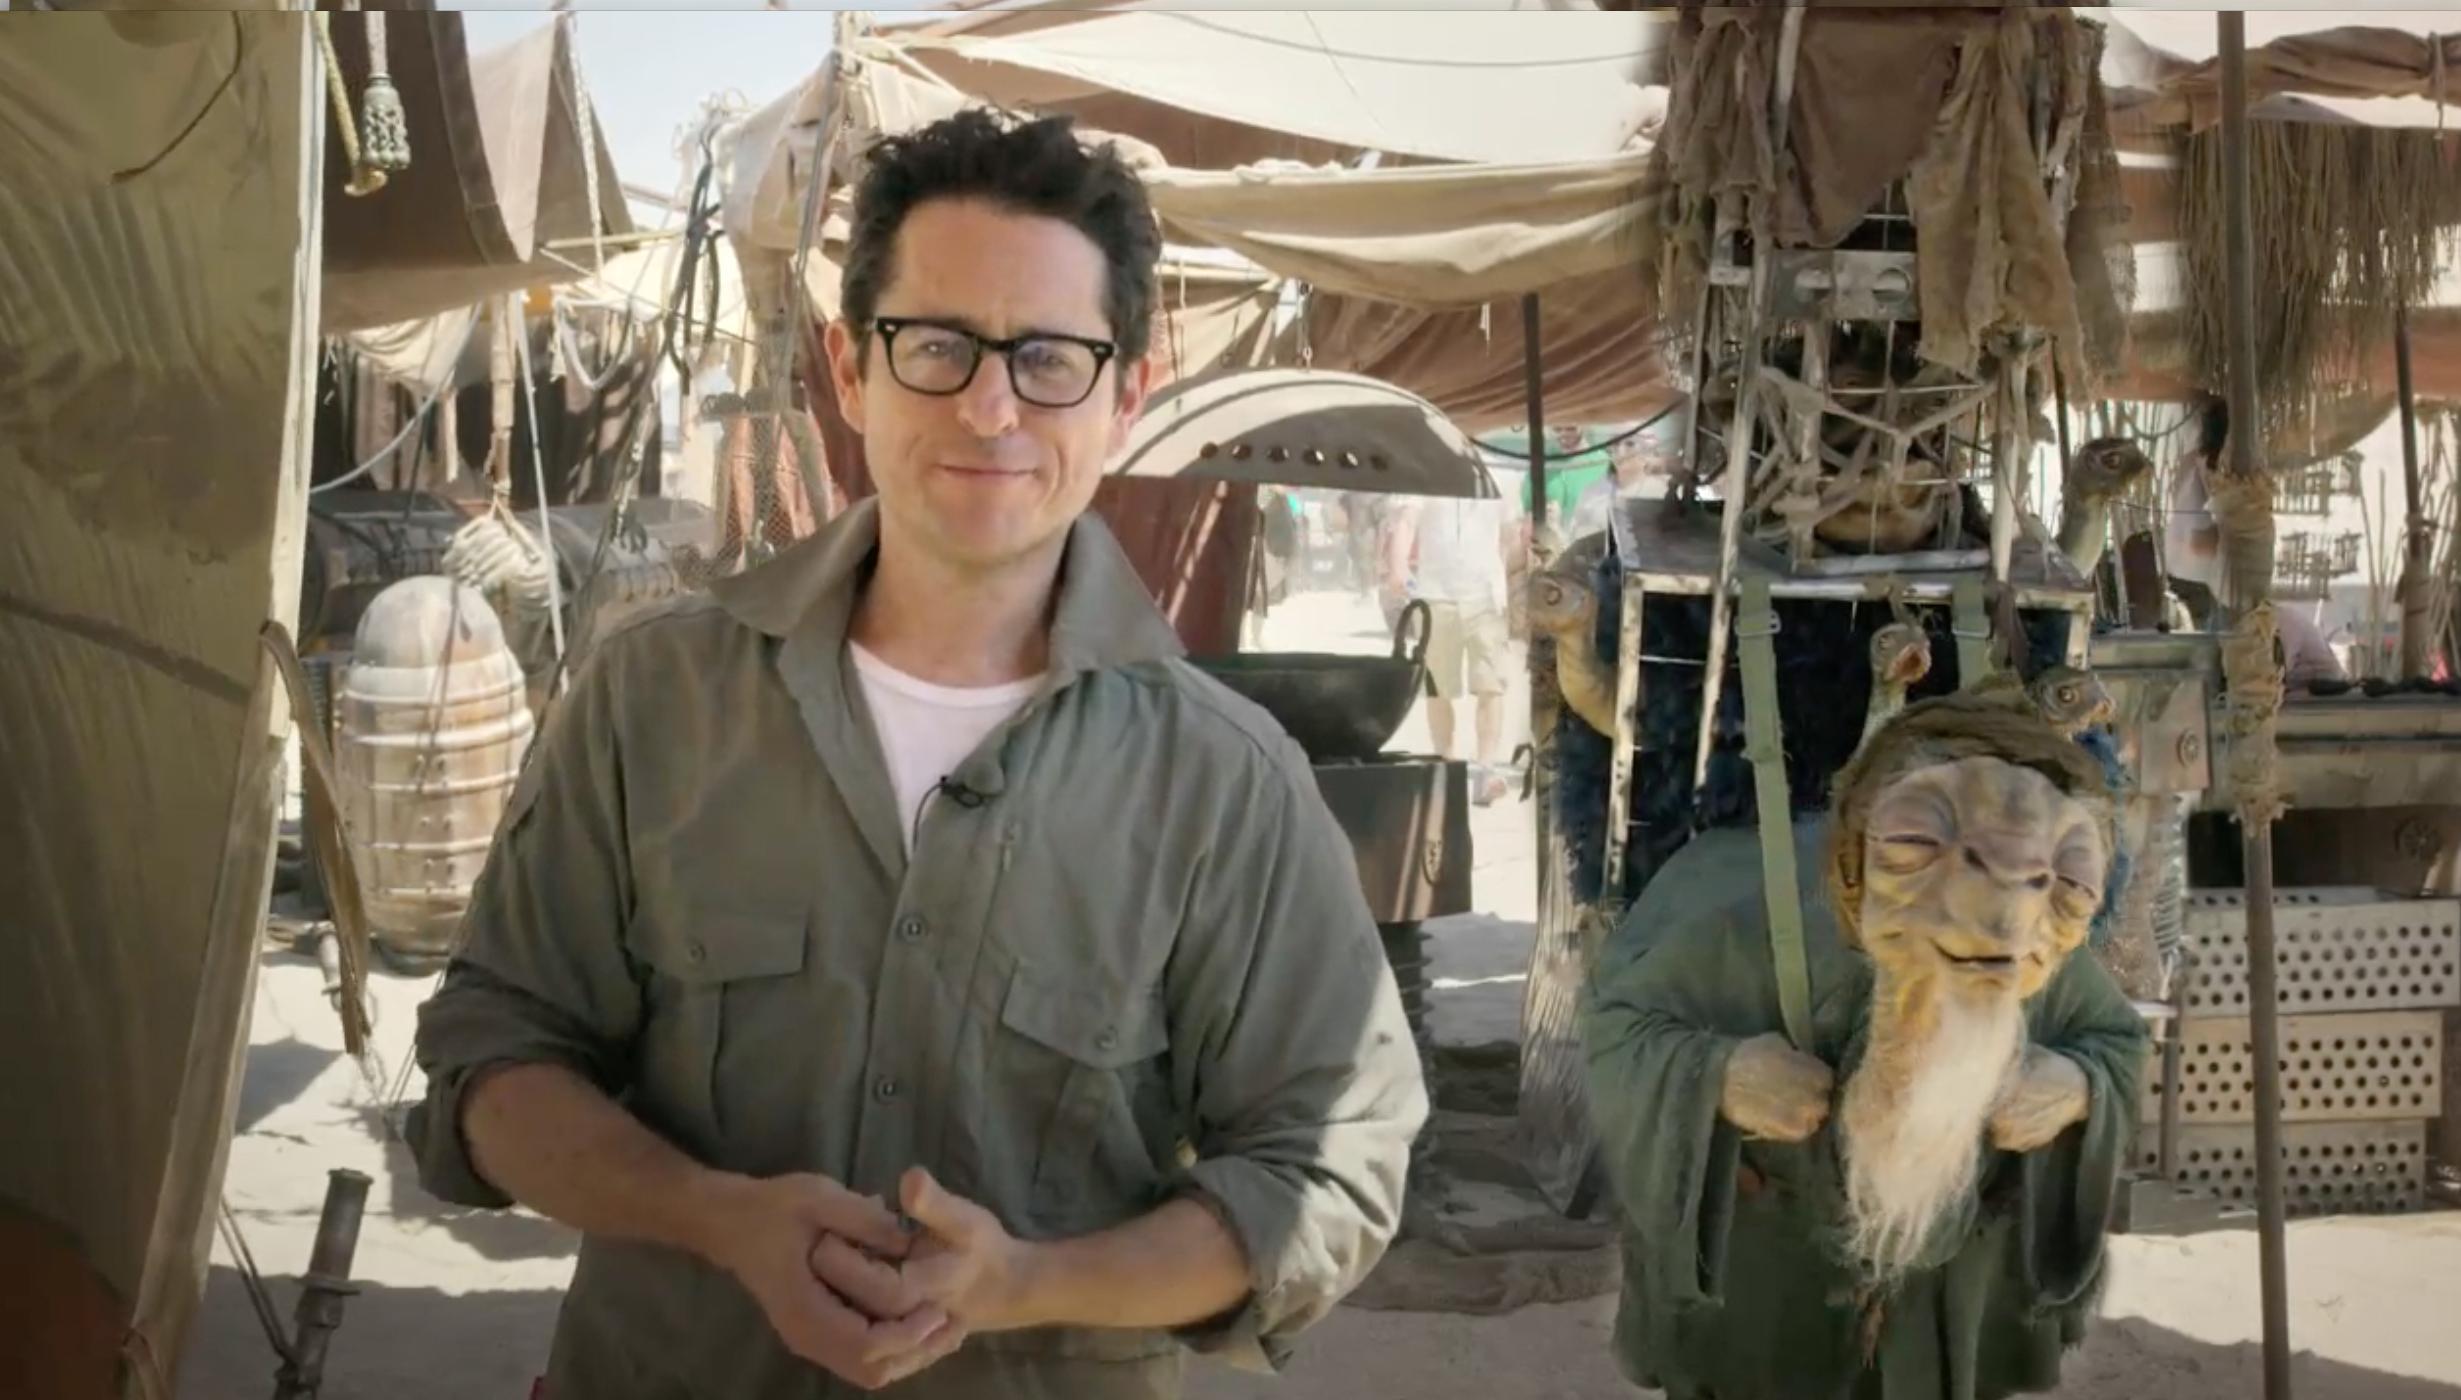 J.J. Abrams Releases First Star Wars Episode 7 Set Video